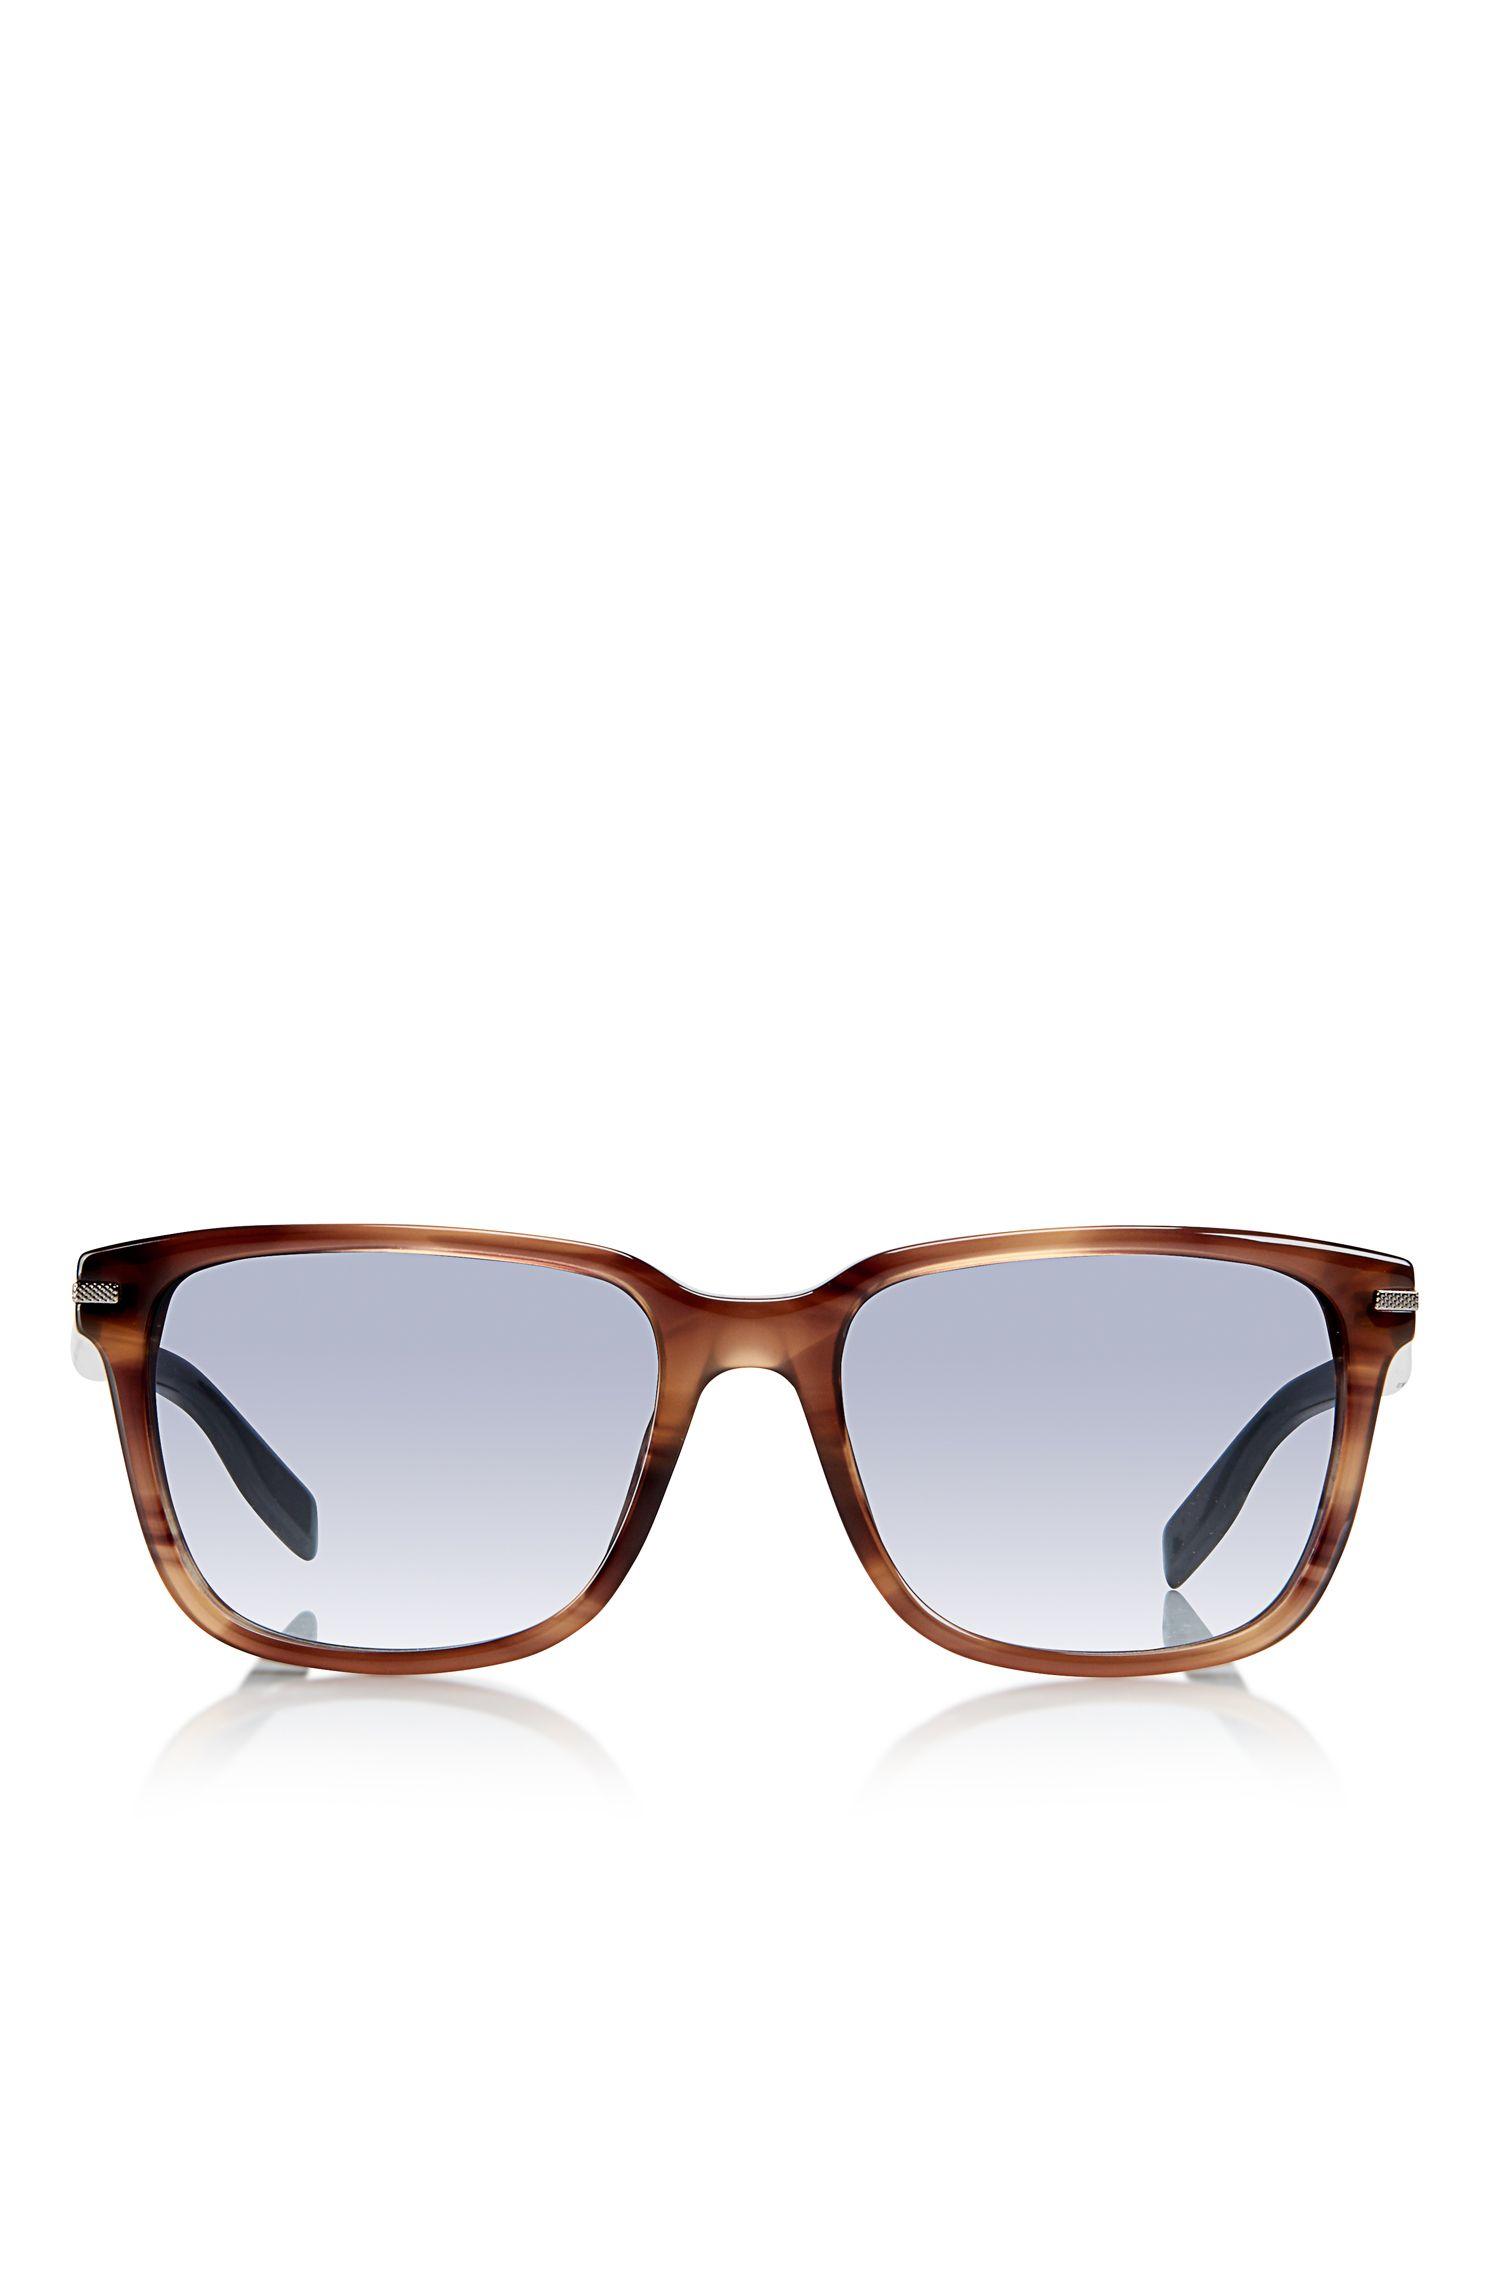 Grey Gradient Lens Sunglasses | BOSS 0623/S